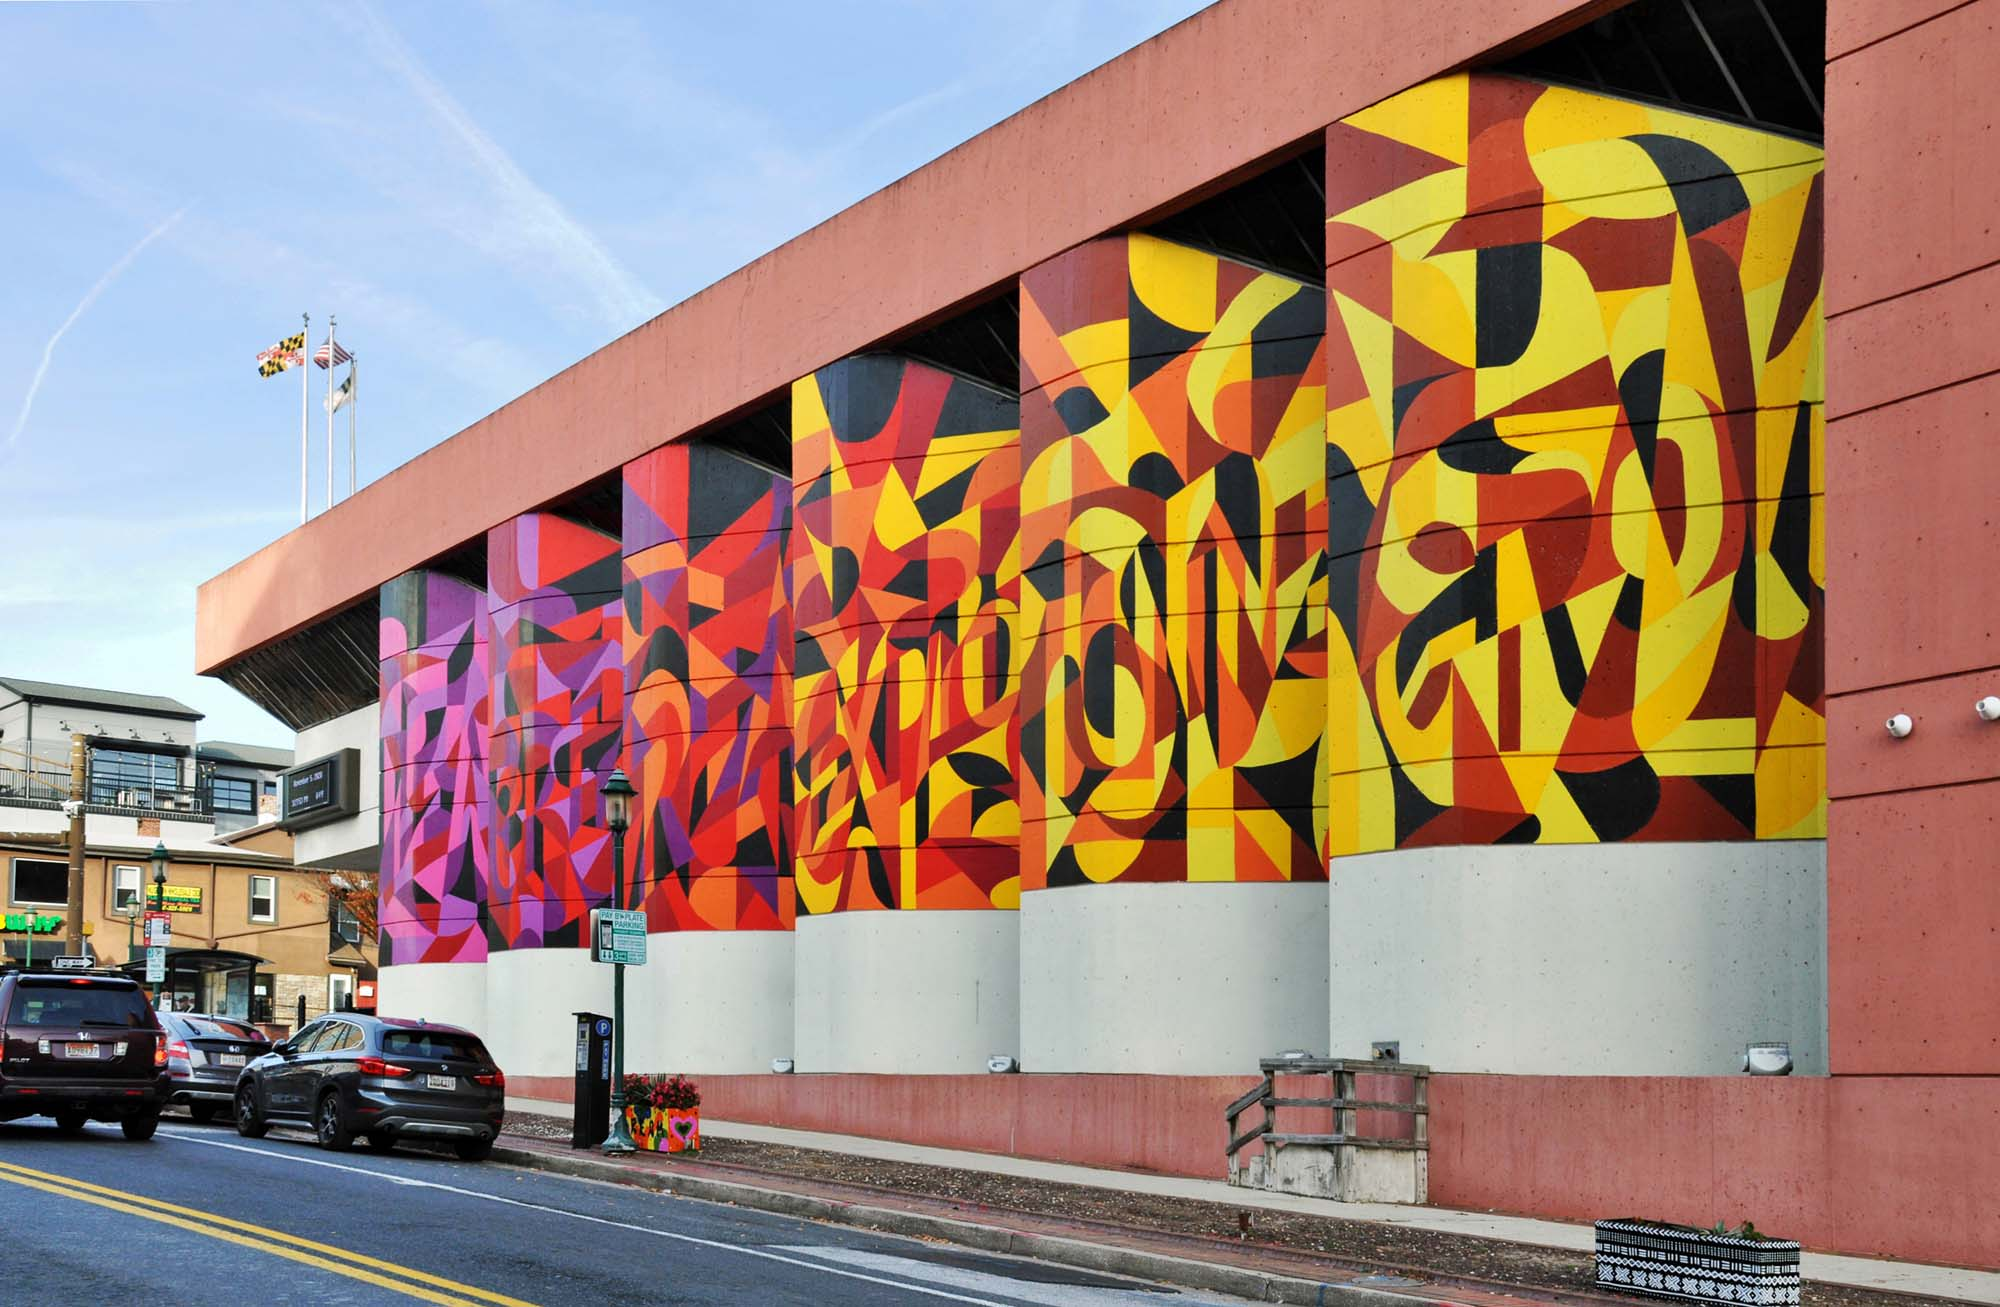 Colorful Geometric Public Art Mural